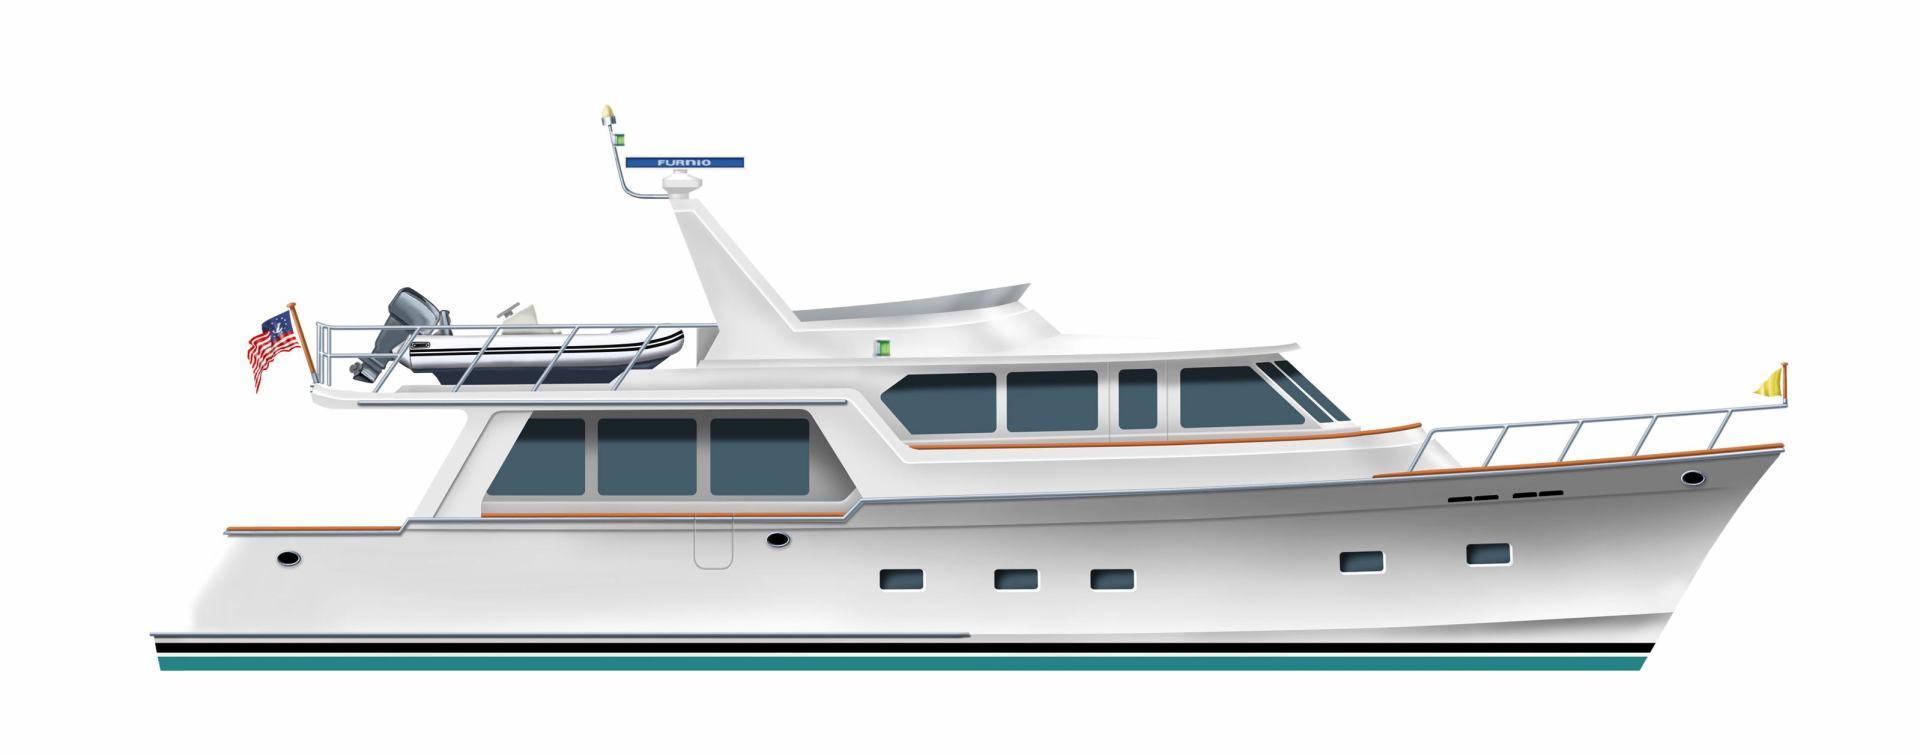 Offshore Yachts-64 Voyager 2020 -Florida-United States-1176155 | Thumbnail